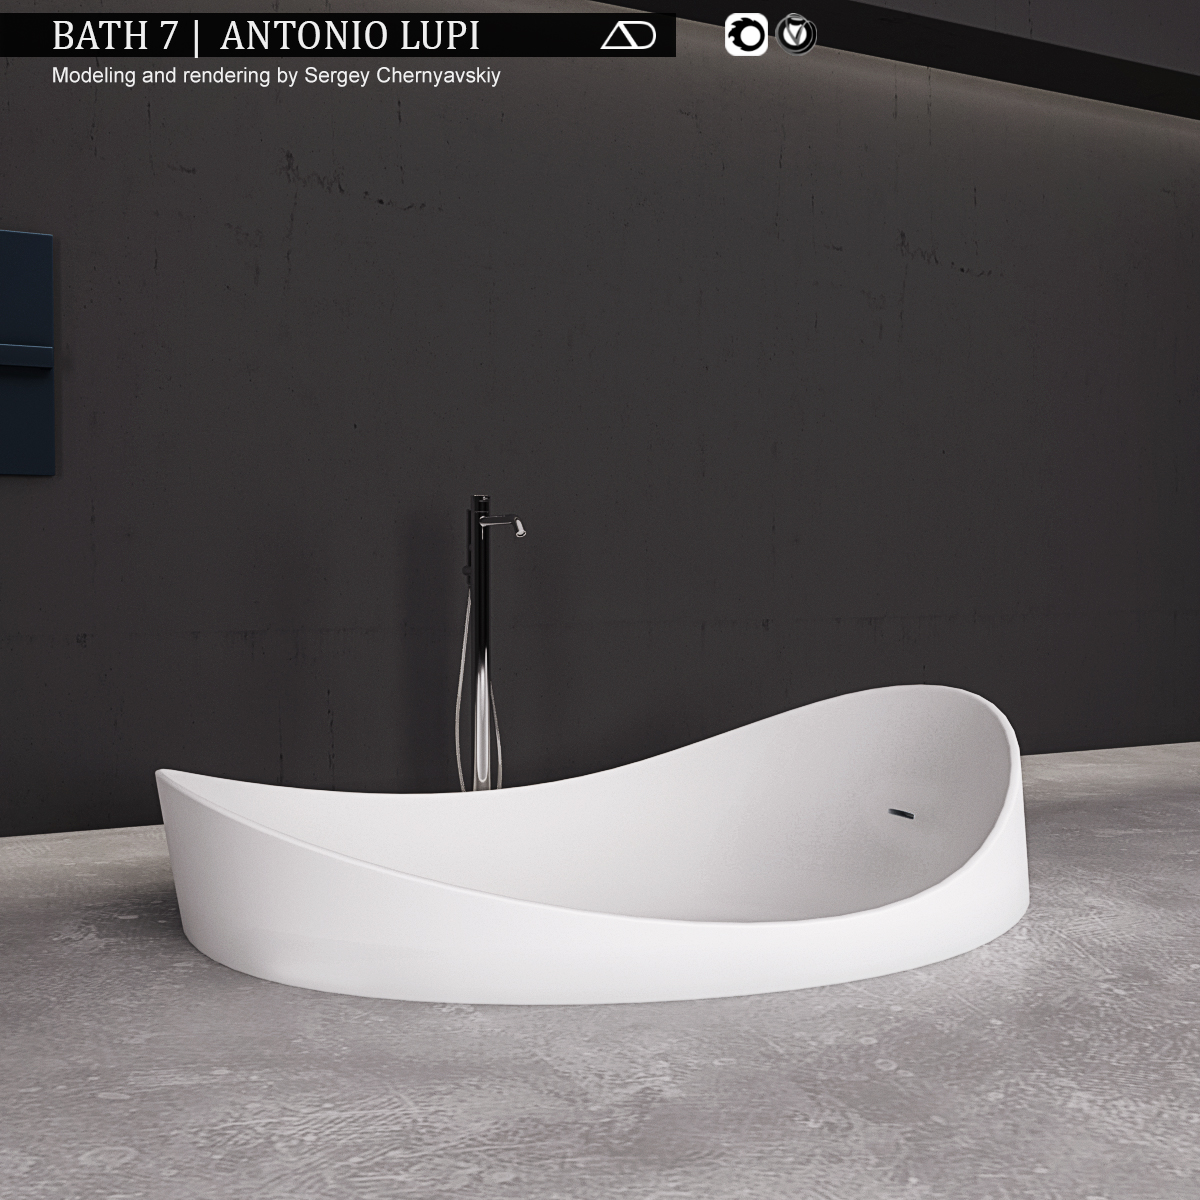 Bath 7 Antonio Lupi